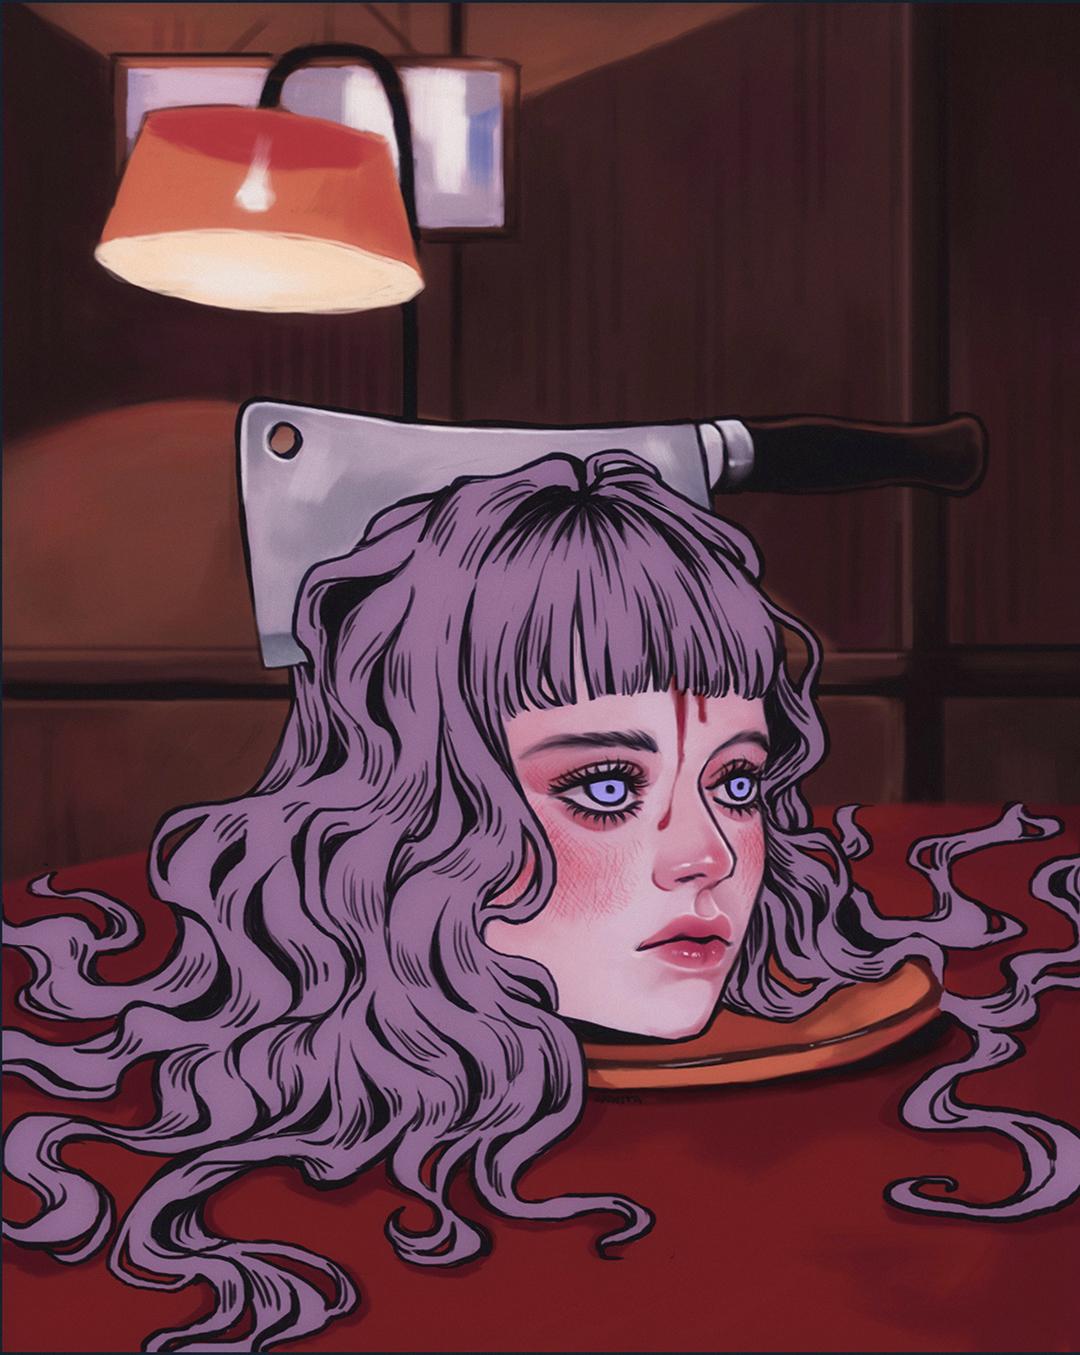 GirlsclubAsia-Illustrator-Anwita Citriya-9